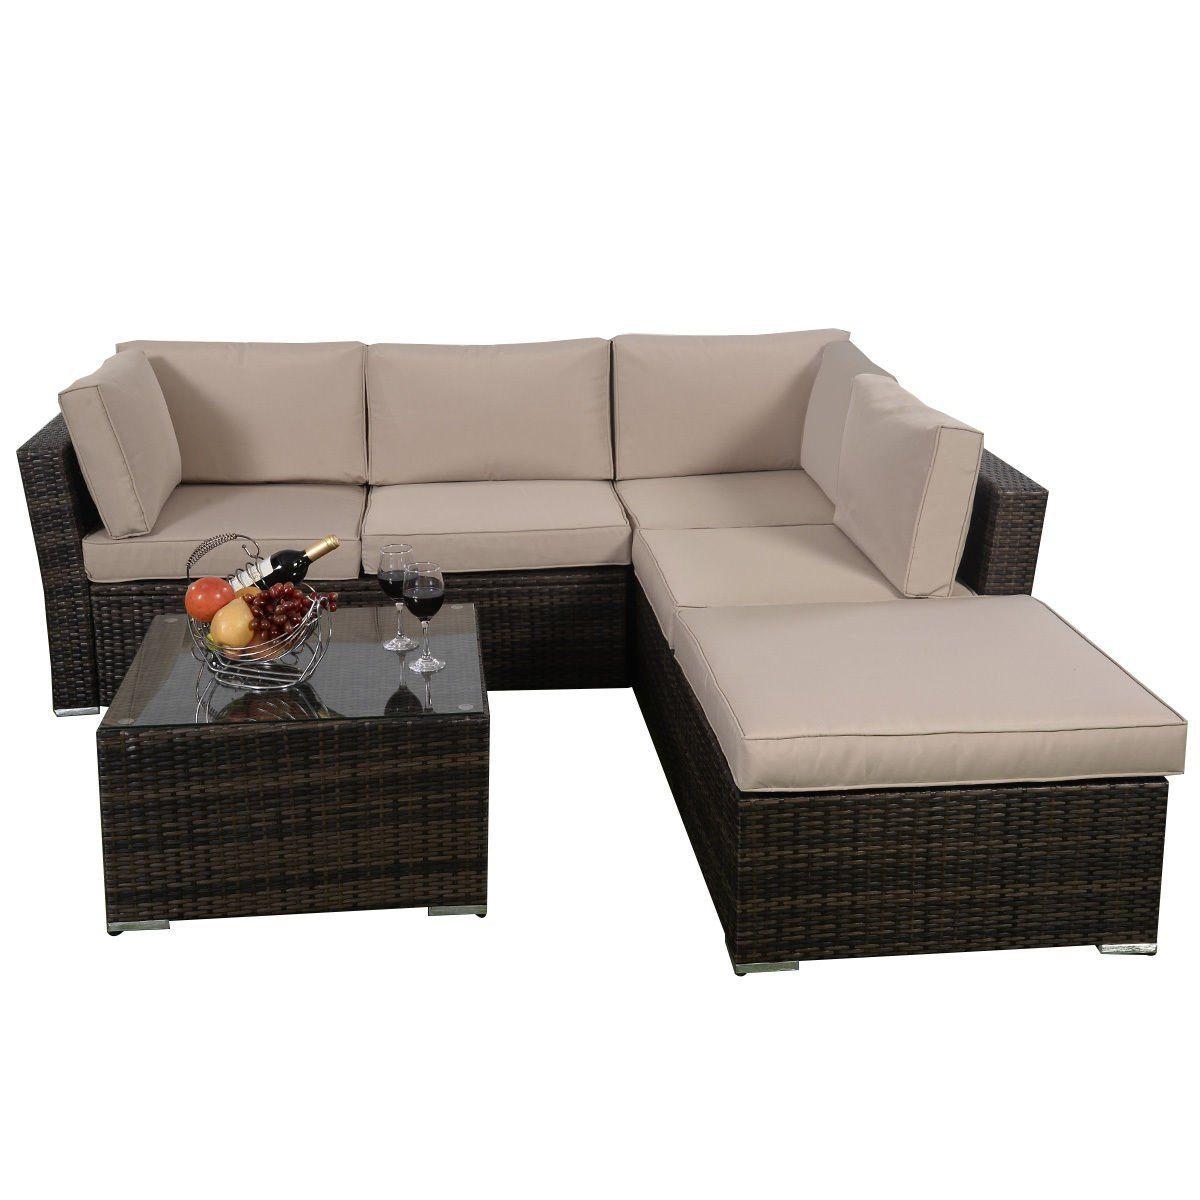 Giantex 4pc patio sectional furniture pe wicker rattan for Sofa exterior amazon